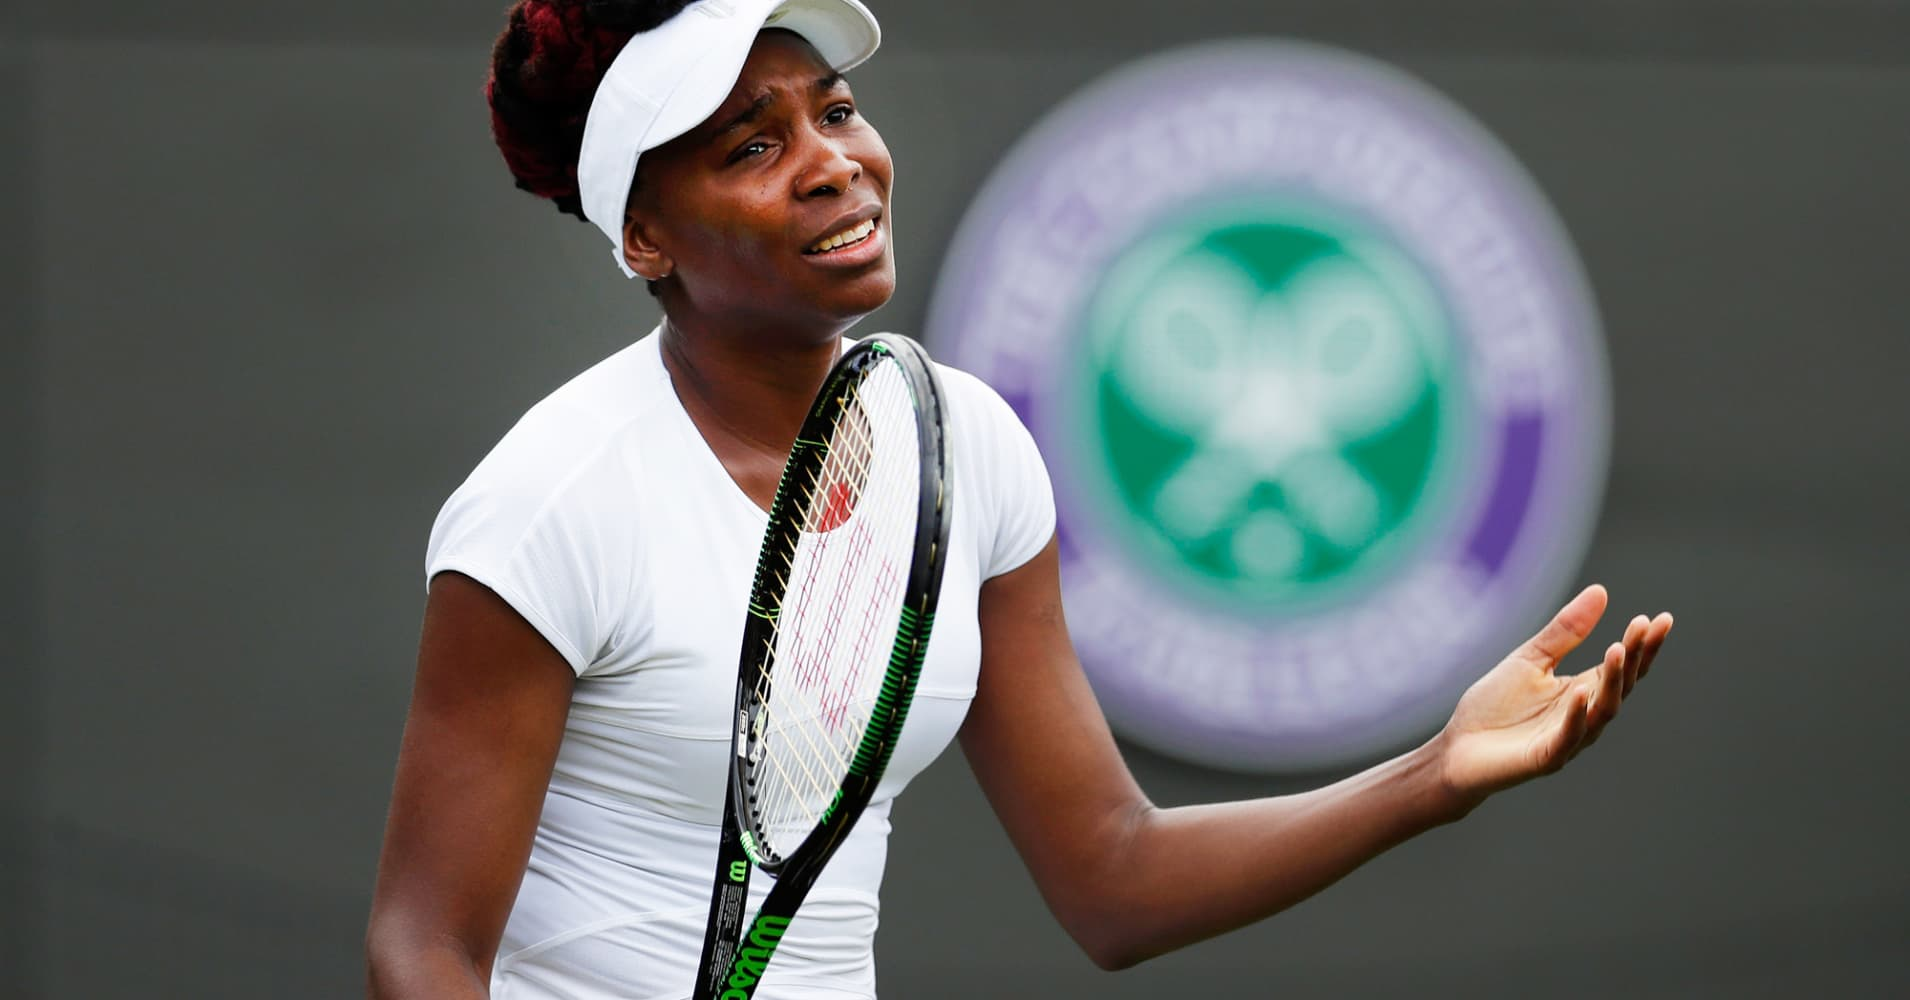 Venus Williams Why athletes make great entrepreneurs